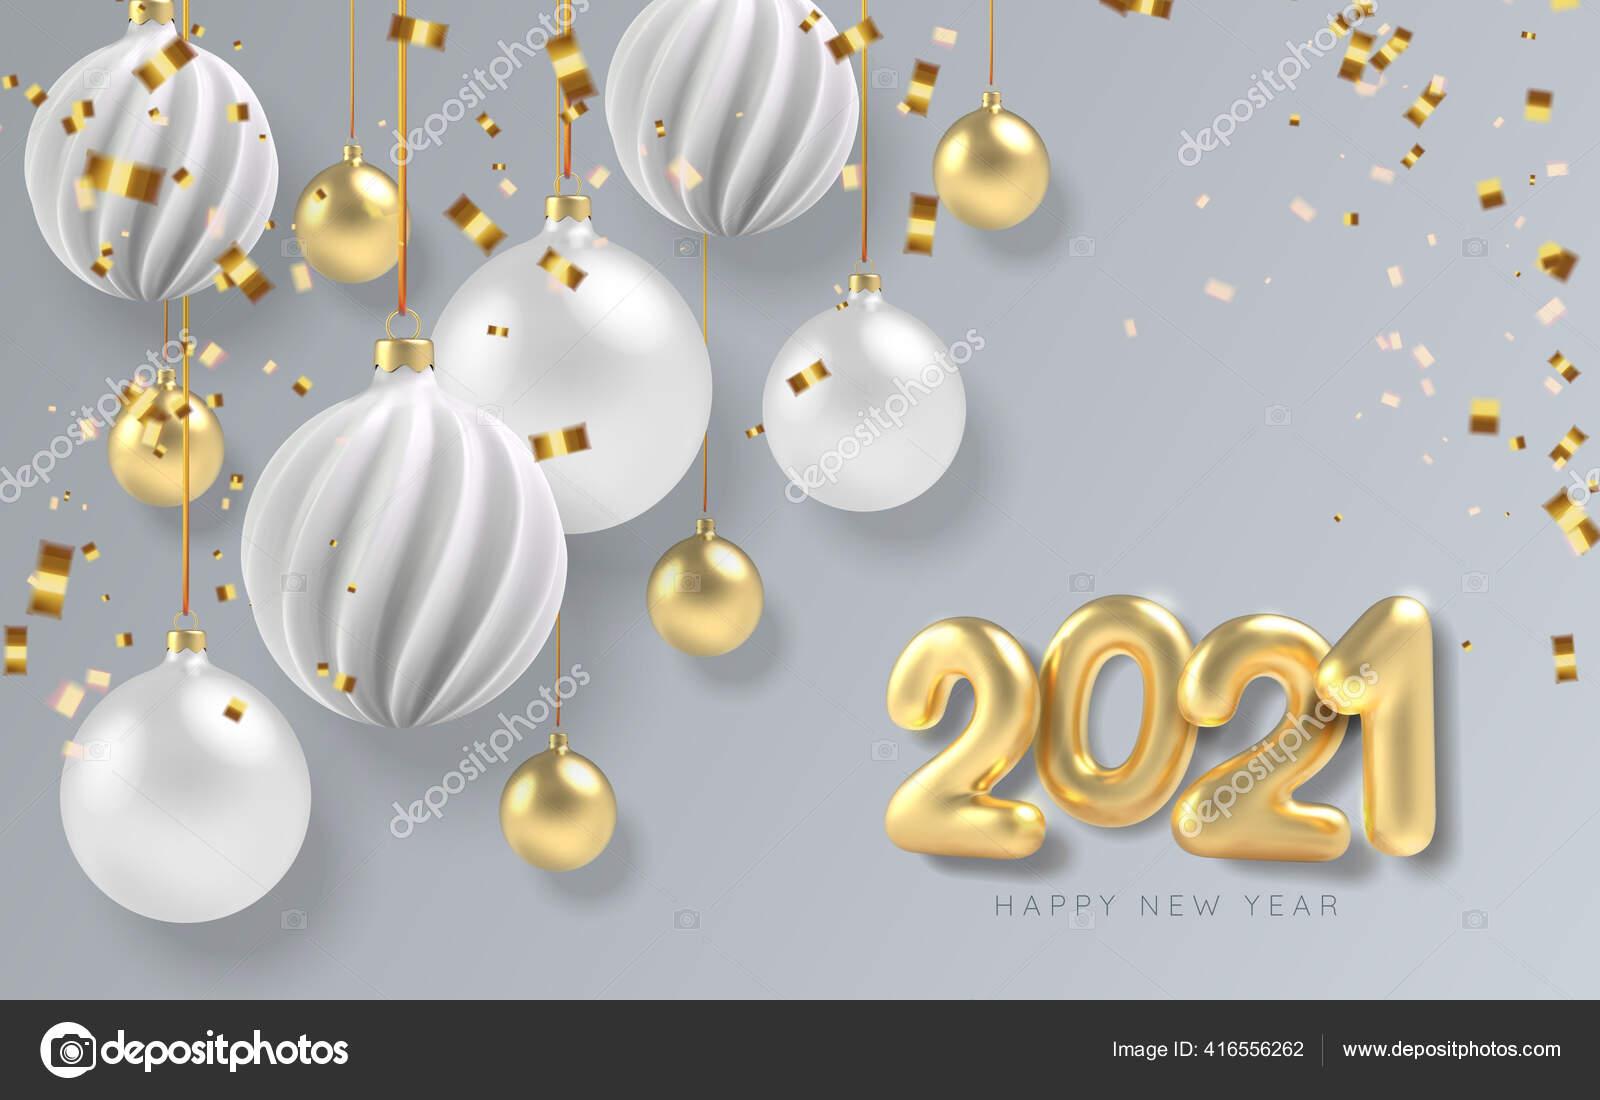 2021 Happy New Year Background White And Gold Christmas Ball In Realistic Style Emas Serpentin Realistis Vektor Stok Vektor C Katrinaku 416556262